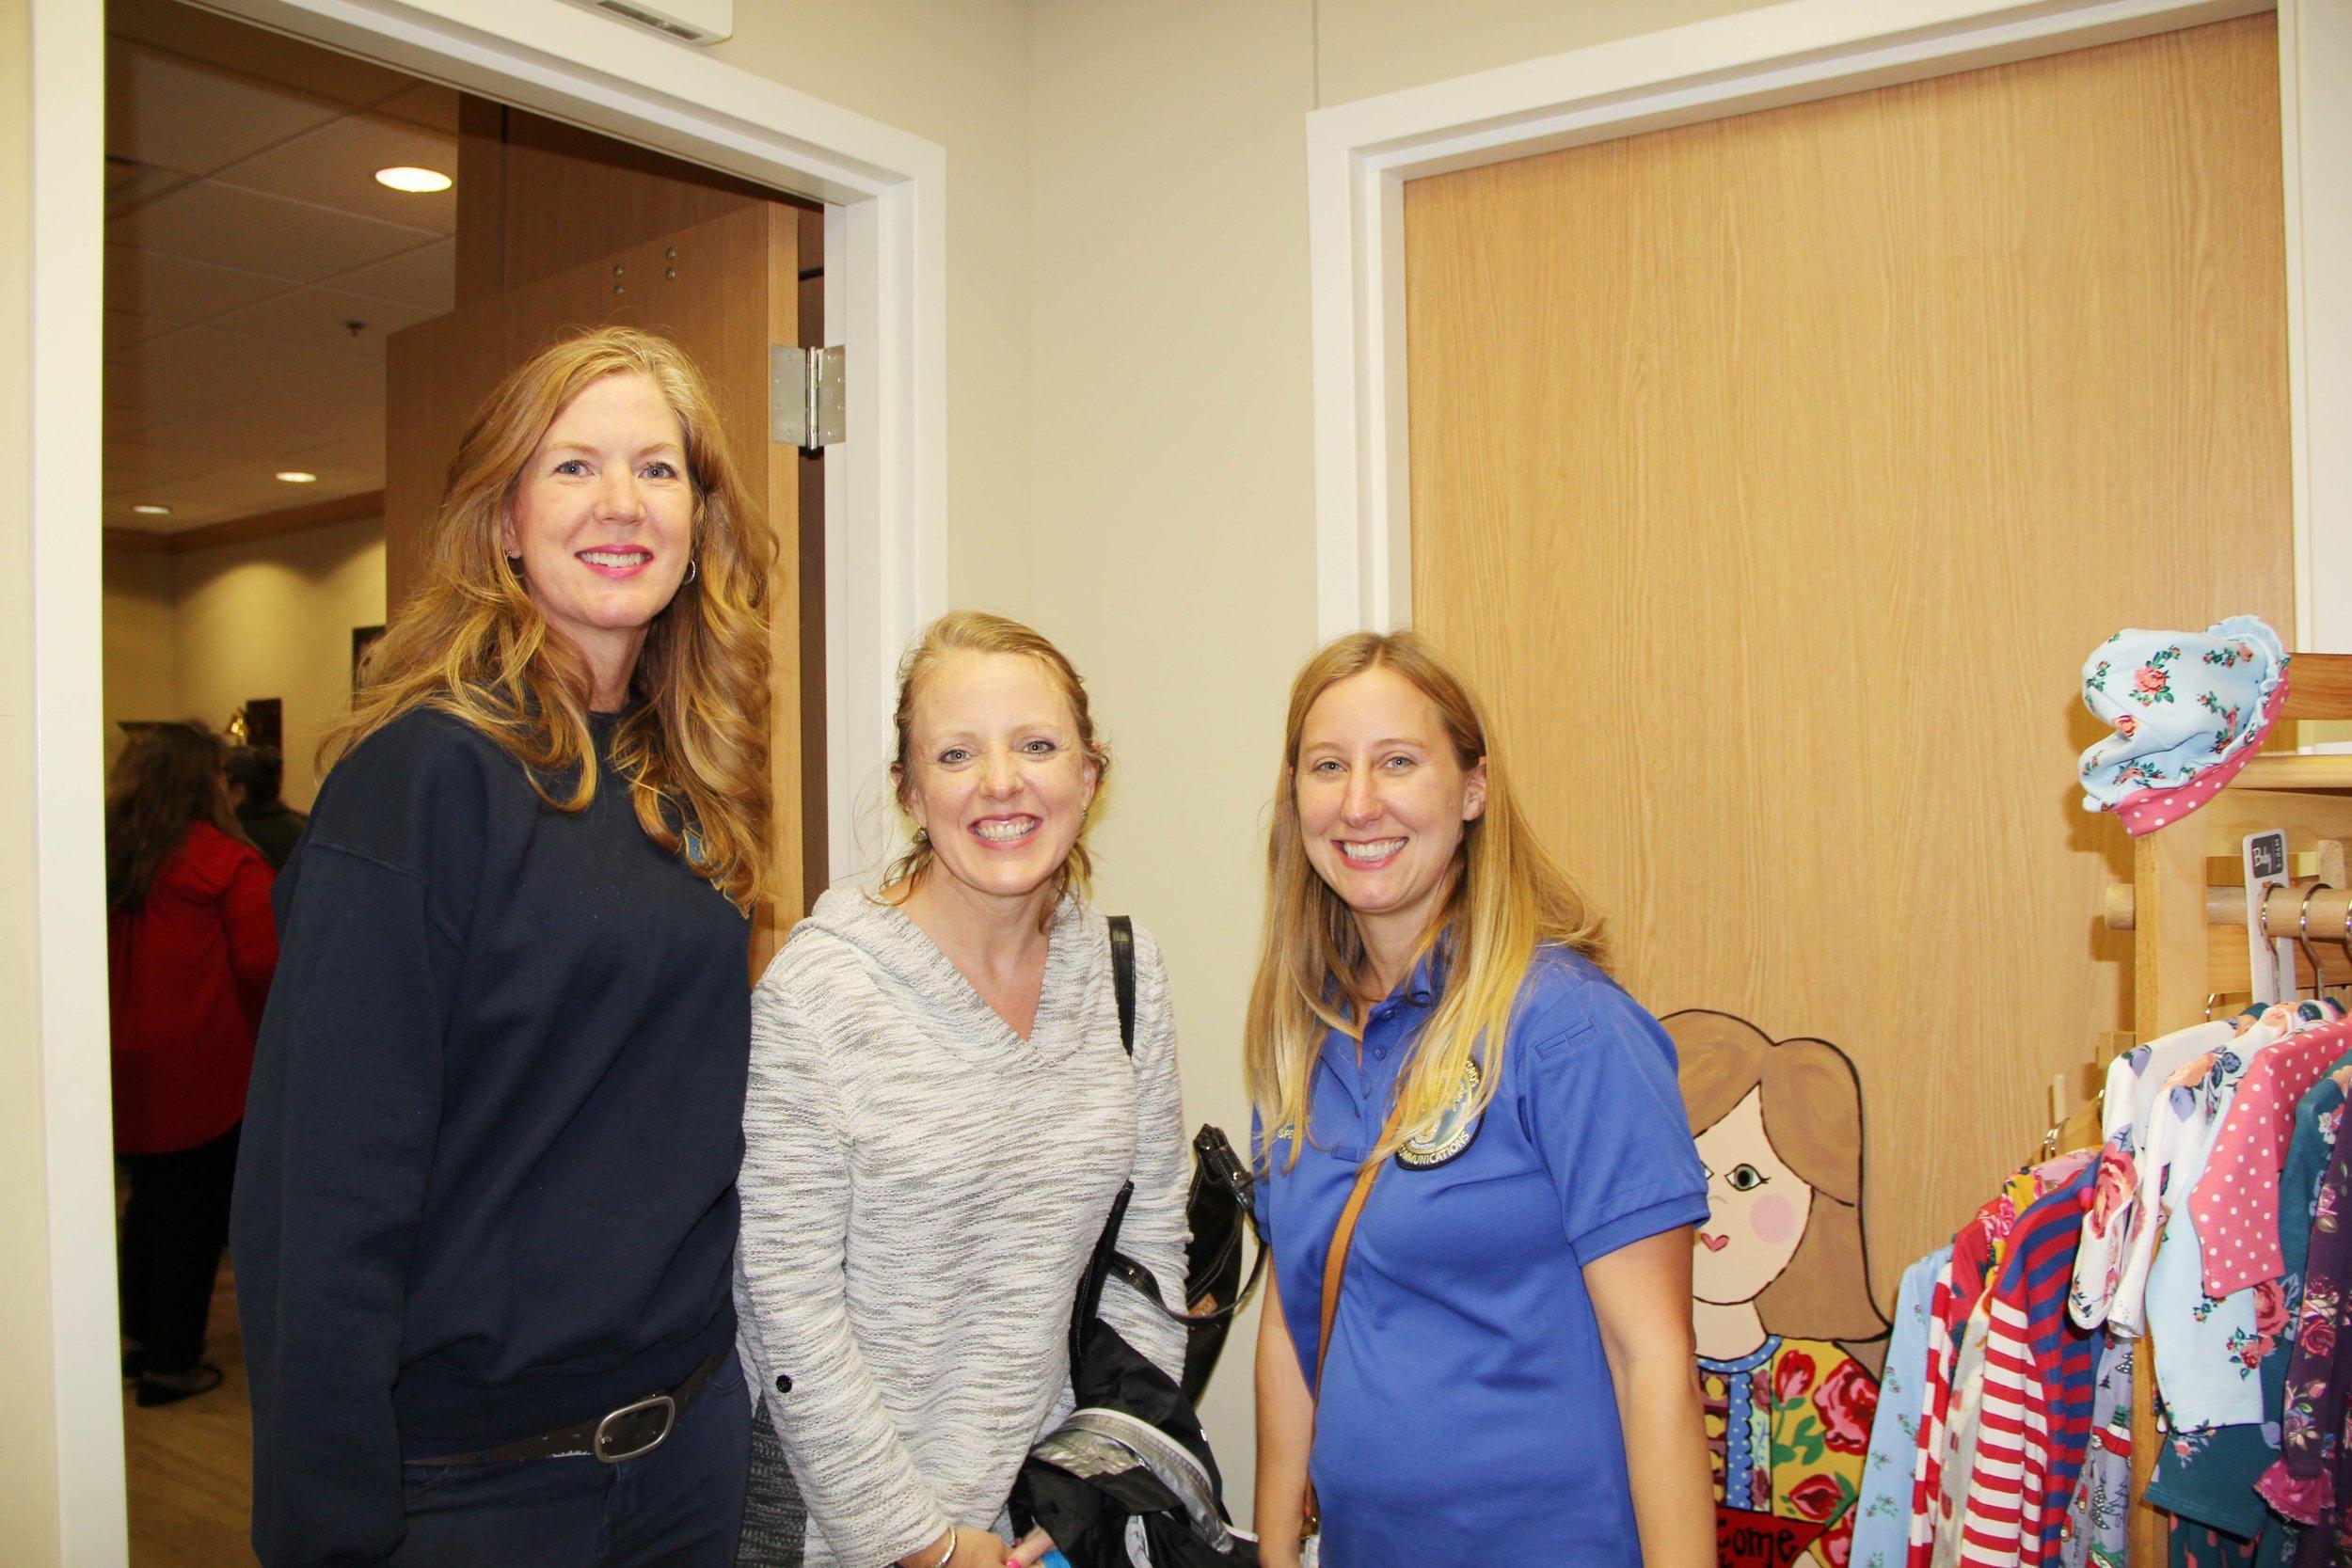 Tracey Litton, Christine Bevers and Jennifer Jones